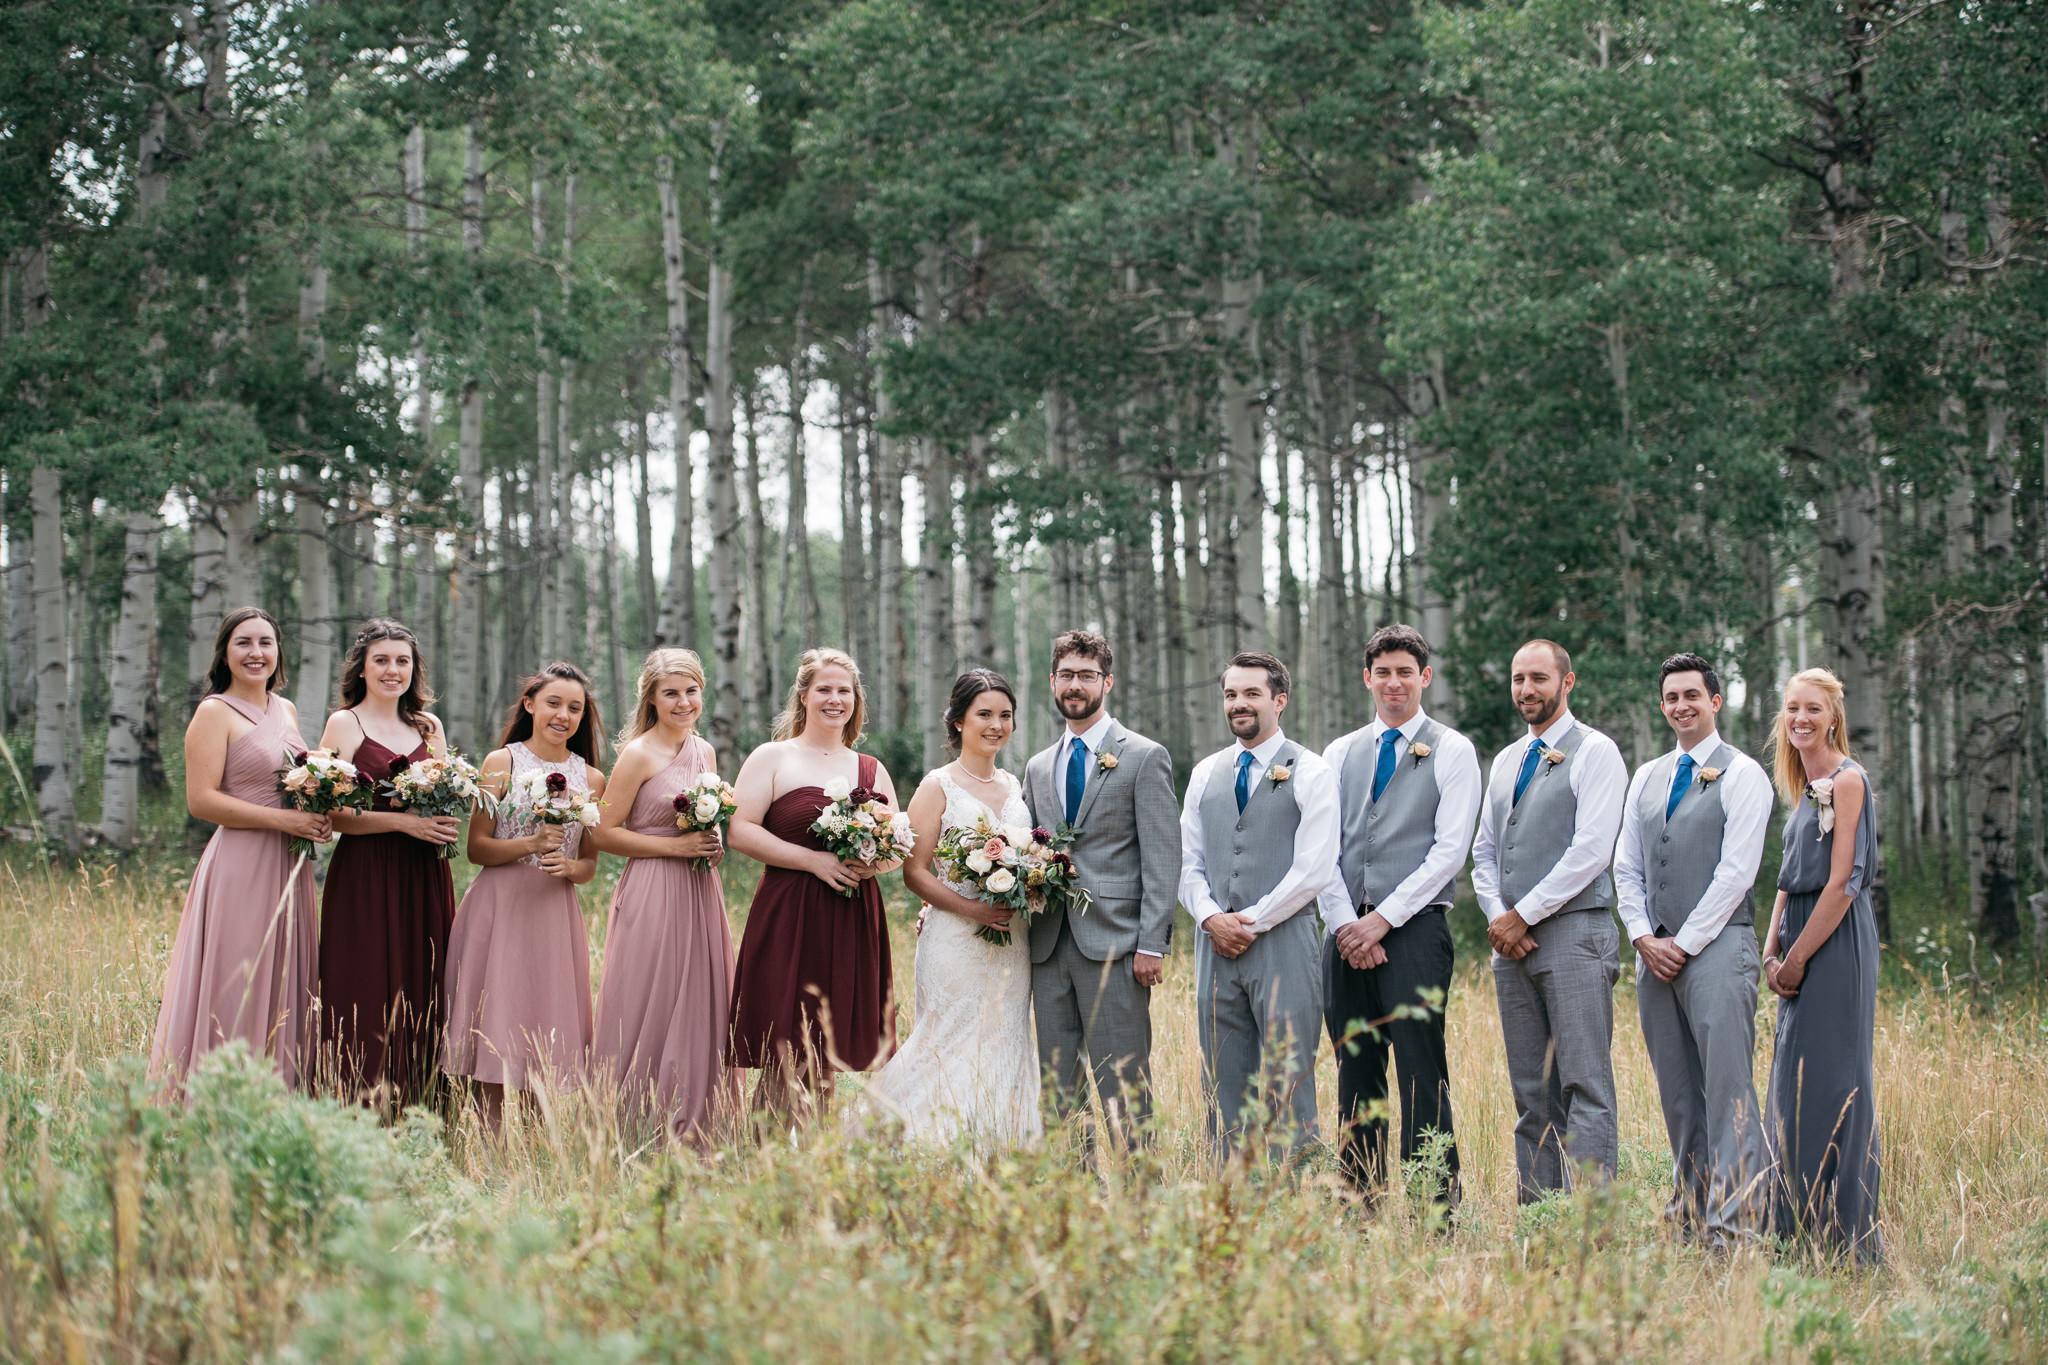 108_ONL_Kat_Nick_Wedding_Trevor_Hooper_Photo.jpg